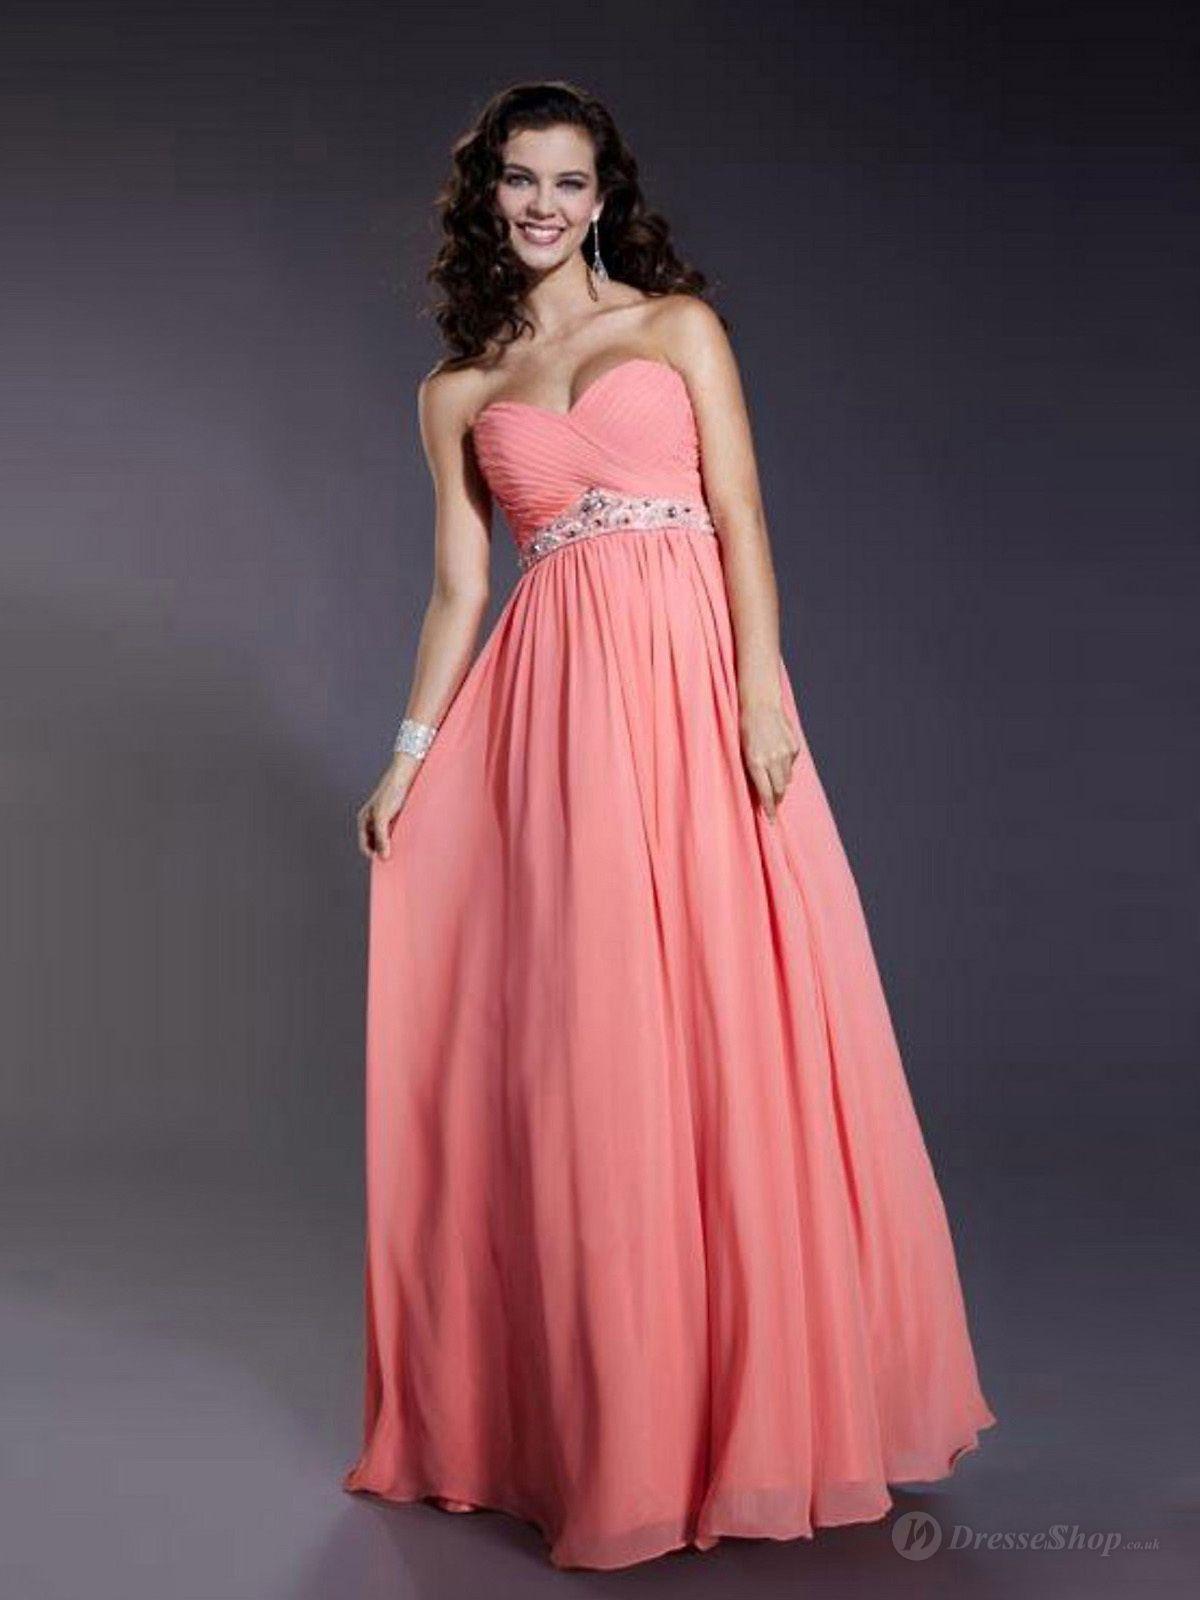 long prom dress long prom dress long prom dress long prom dress long ...